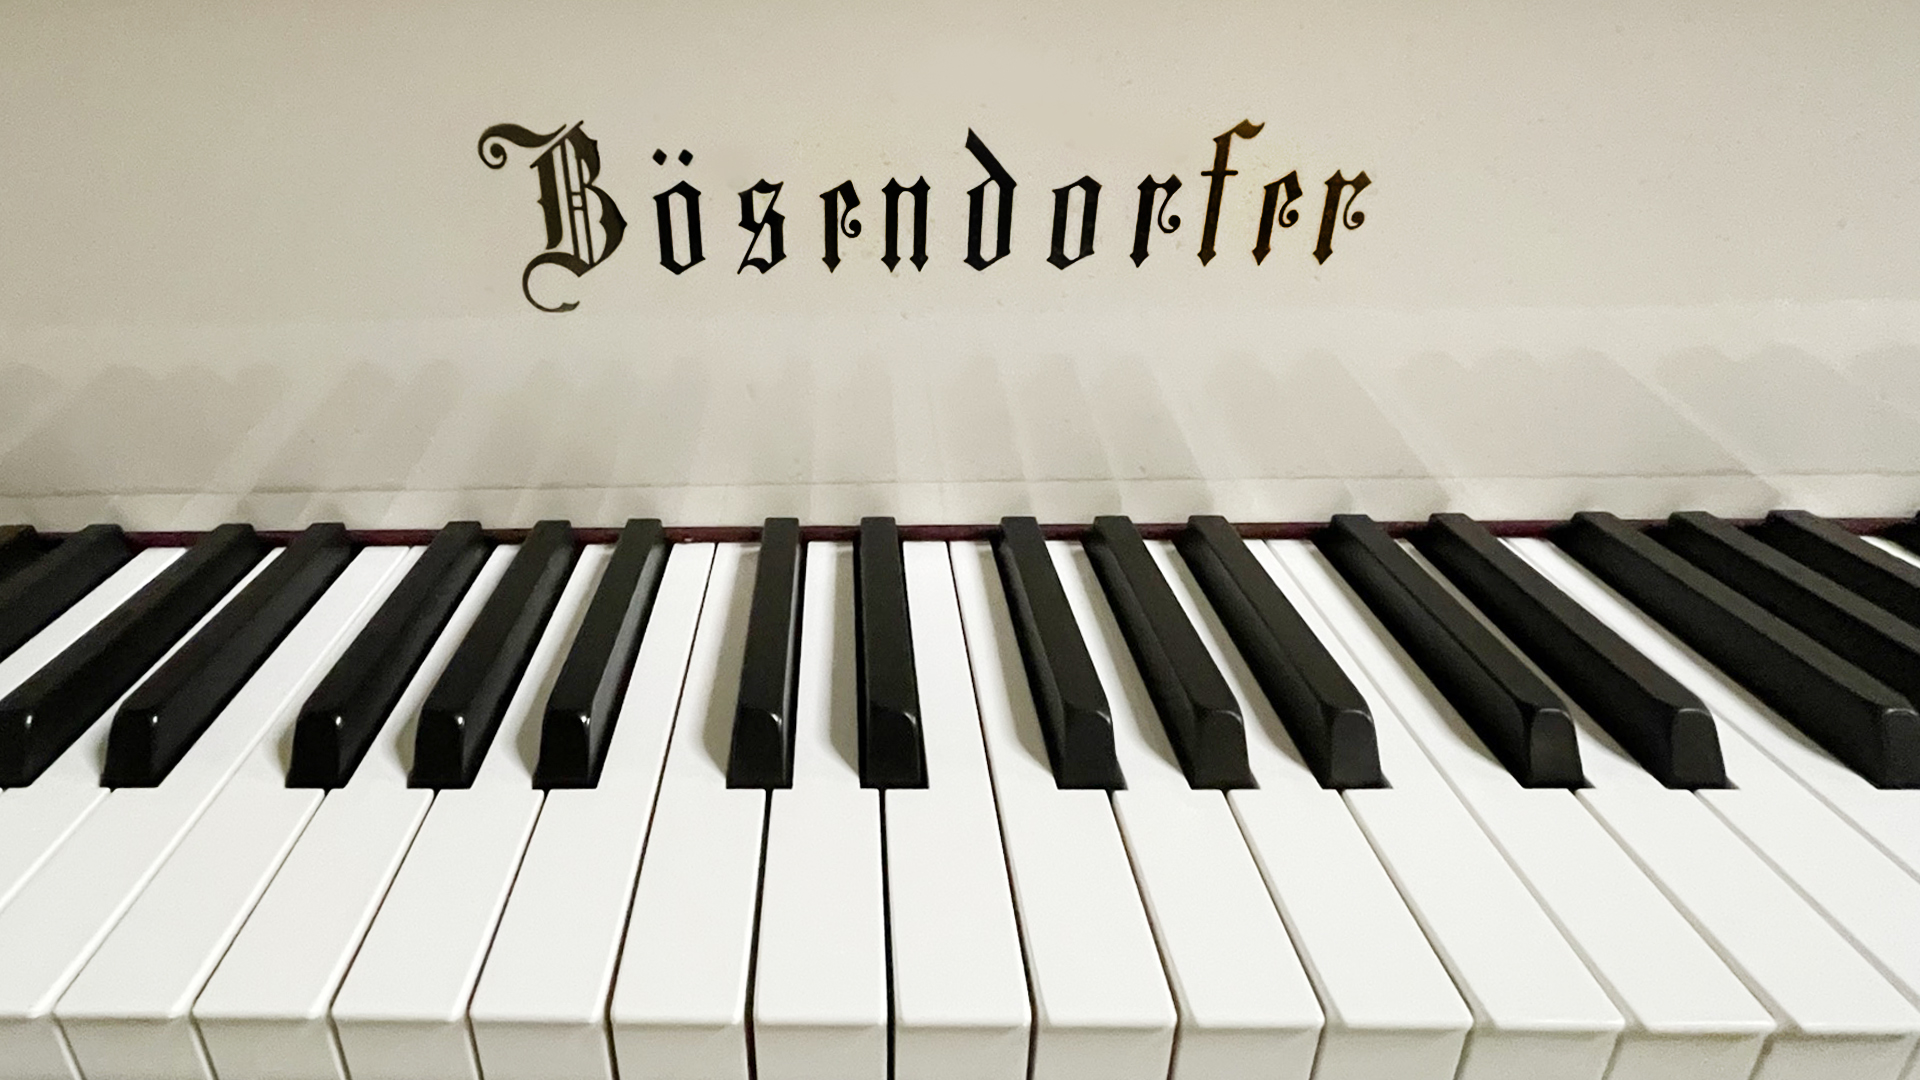 Jean Cocteau Bösendorfer grand piano, Artist Series, Limited edition - One Zen Place Art and Piano Gallery, Vero Beach Pianos, Vero Beach, Florida, Treasure Coast, Indian River County,